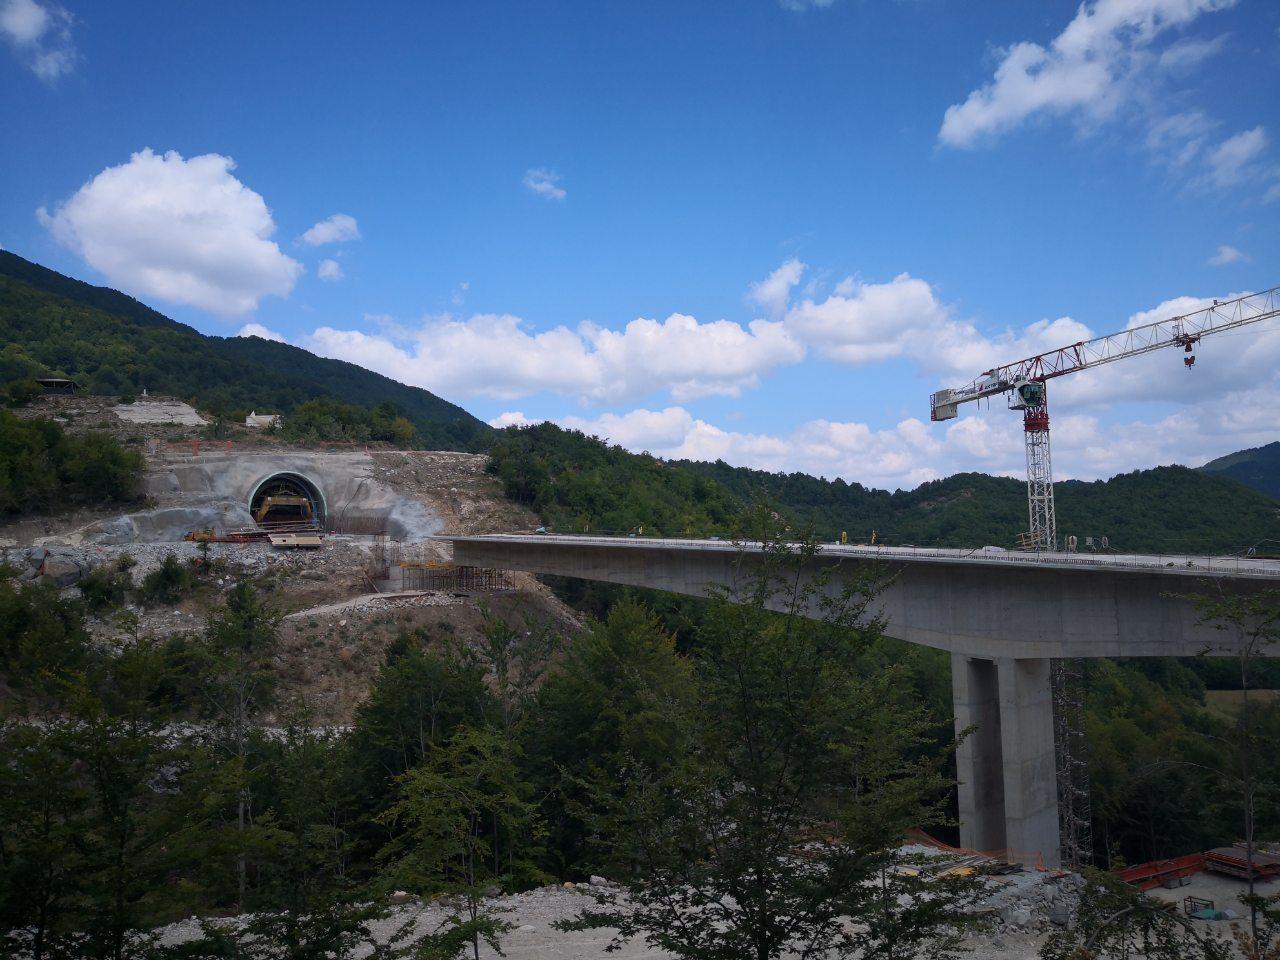 Construction of a bridge and tunnel near the Greece-Bulgaria border as part of the CrossBo project. ©Egnatia Odos SA (2020)